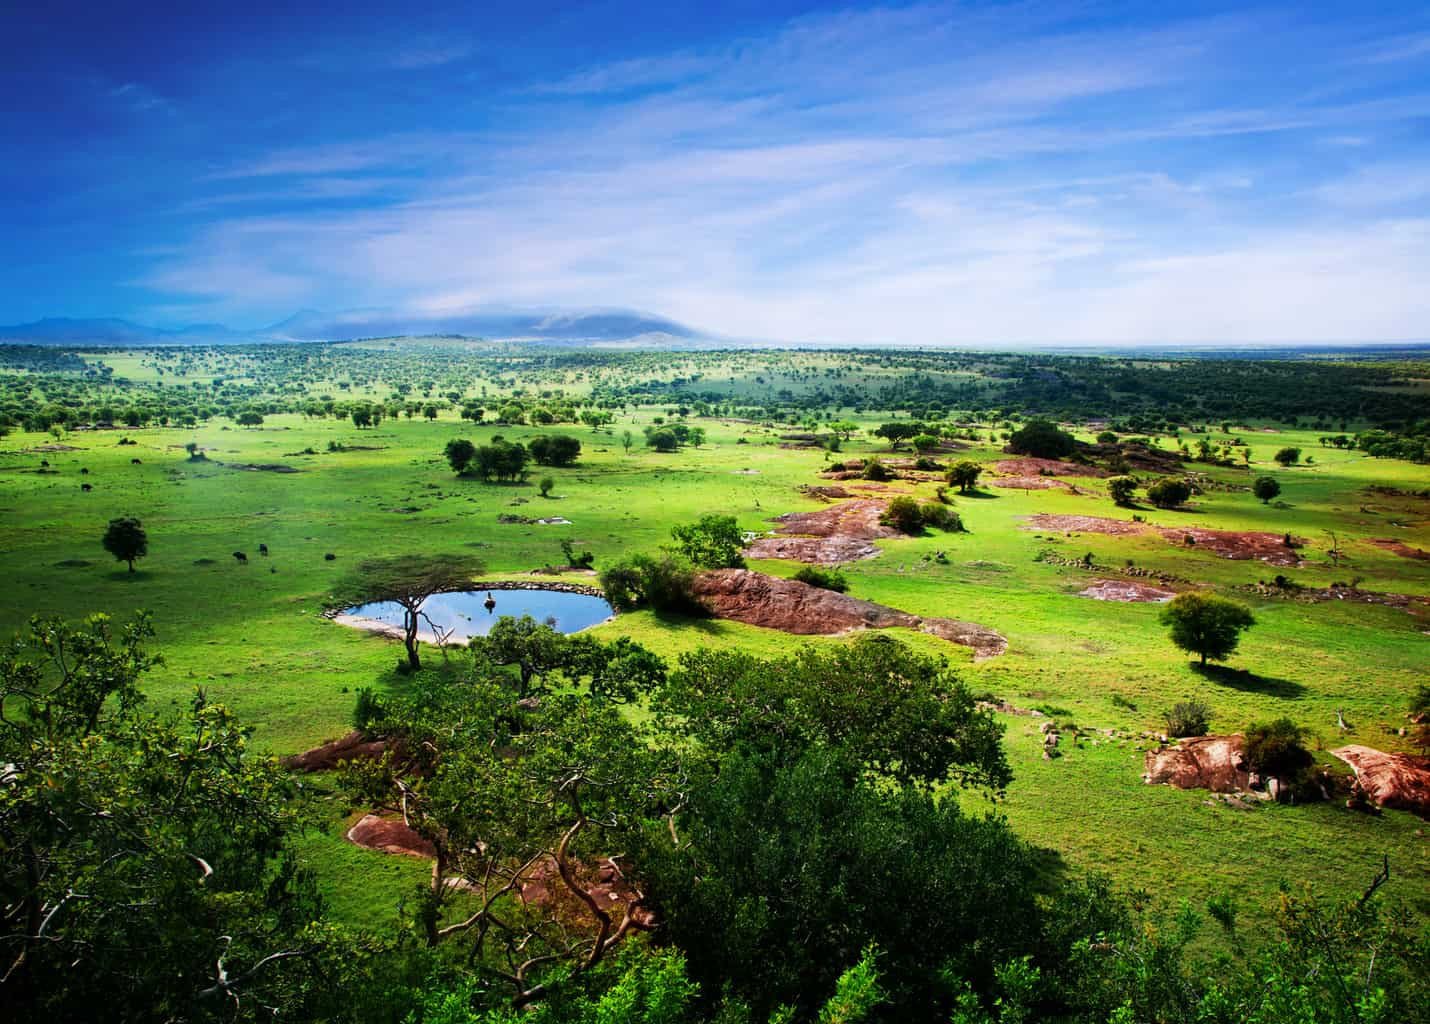 Savanna in Tanzania